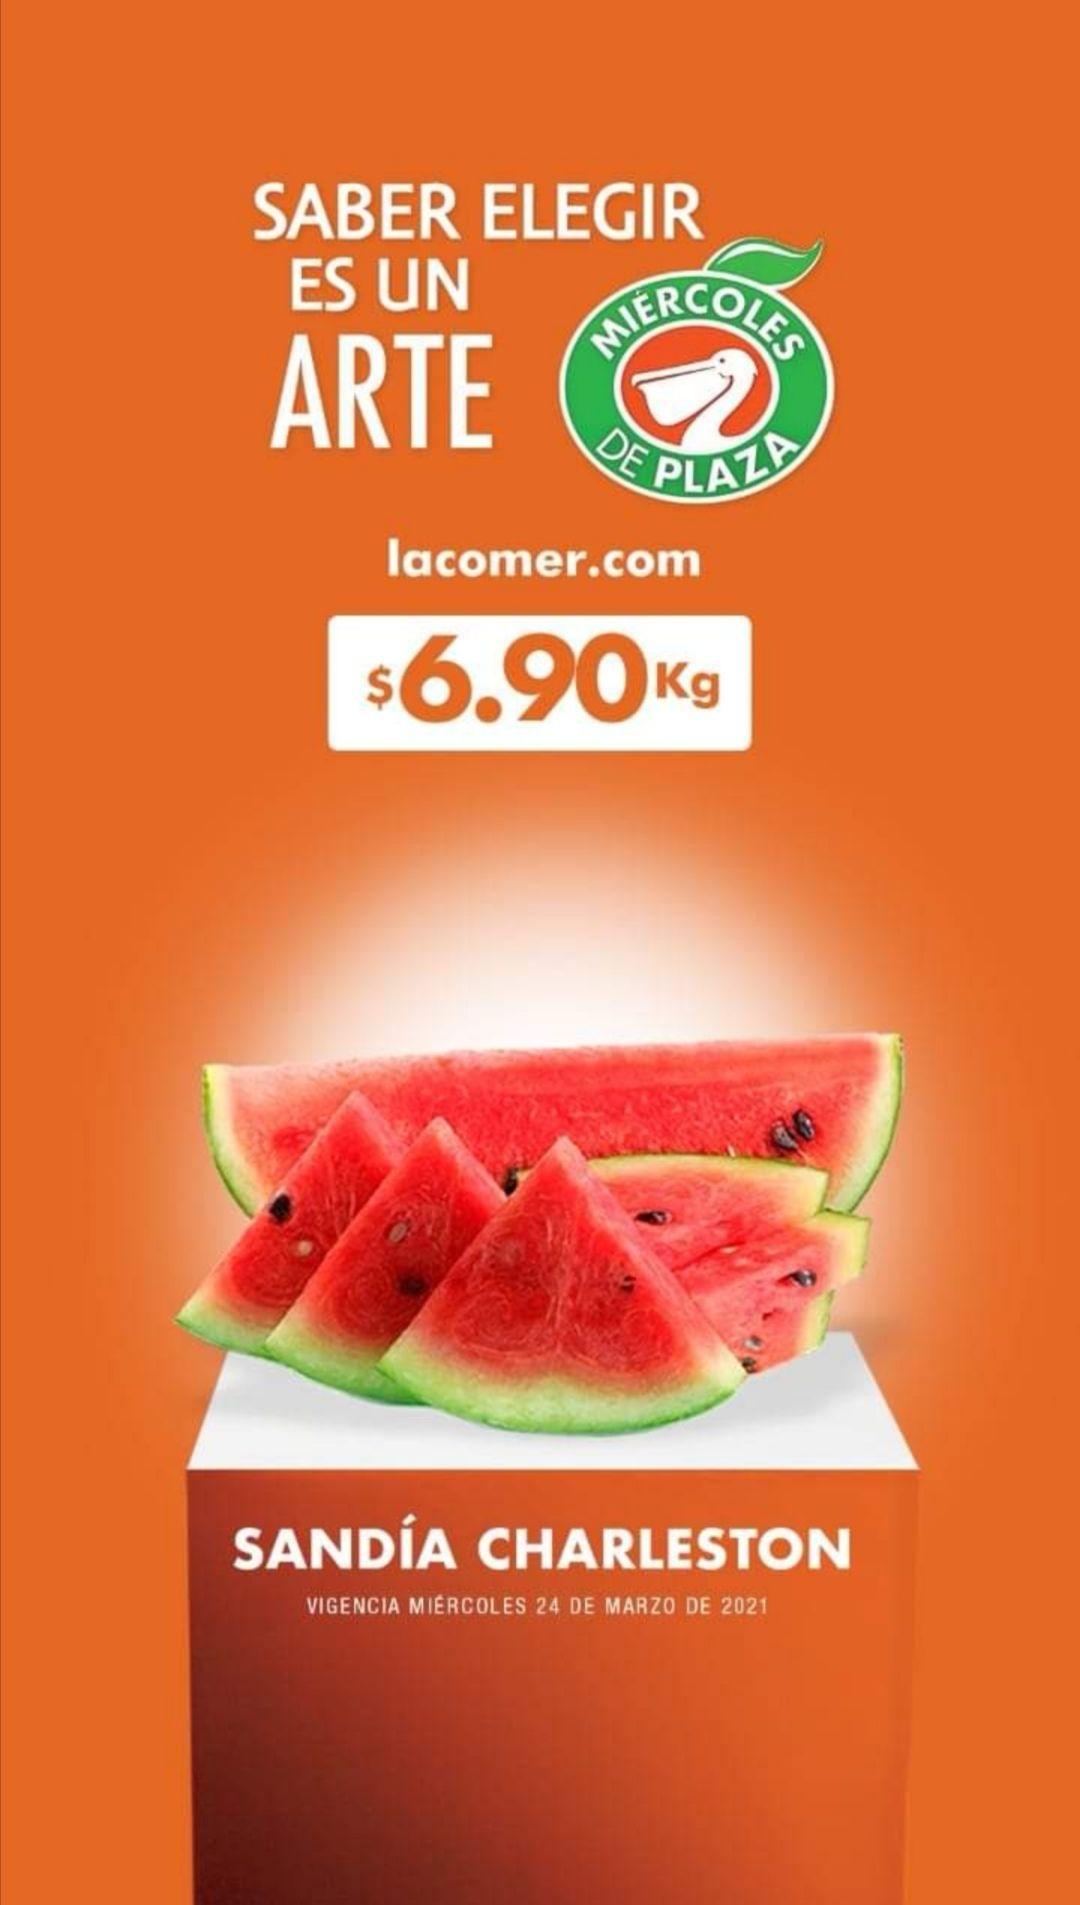 La Comer y Fresko: Miércoles de Plaza 24 Marzo: Sandía ó Naranja $6.90 kg... Jitomate ó Piña $9.90 kg.